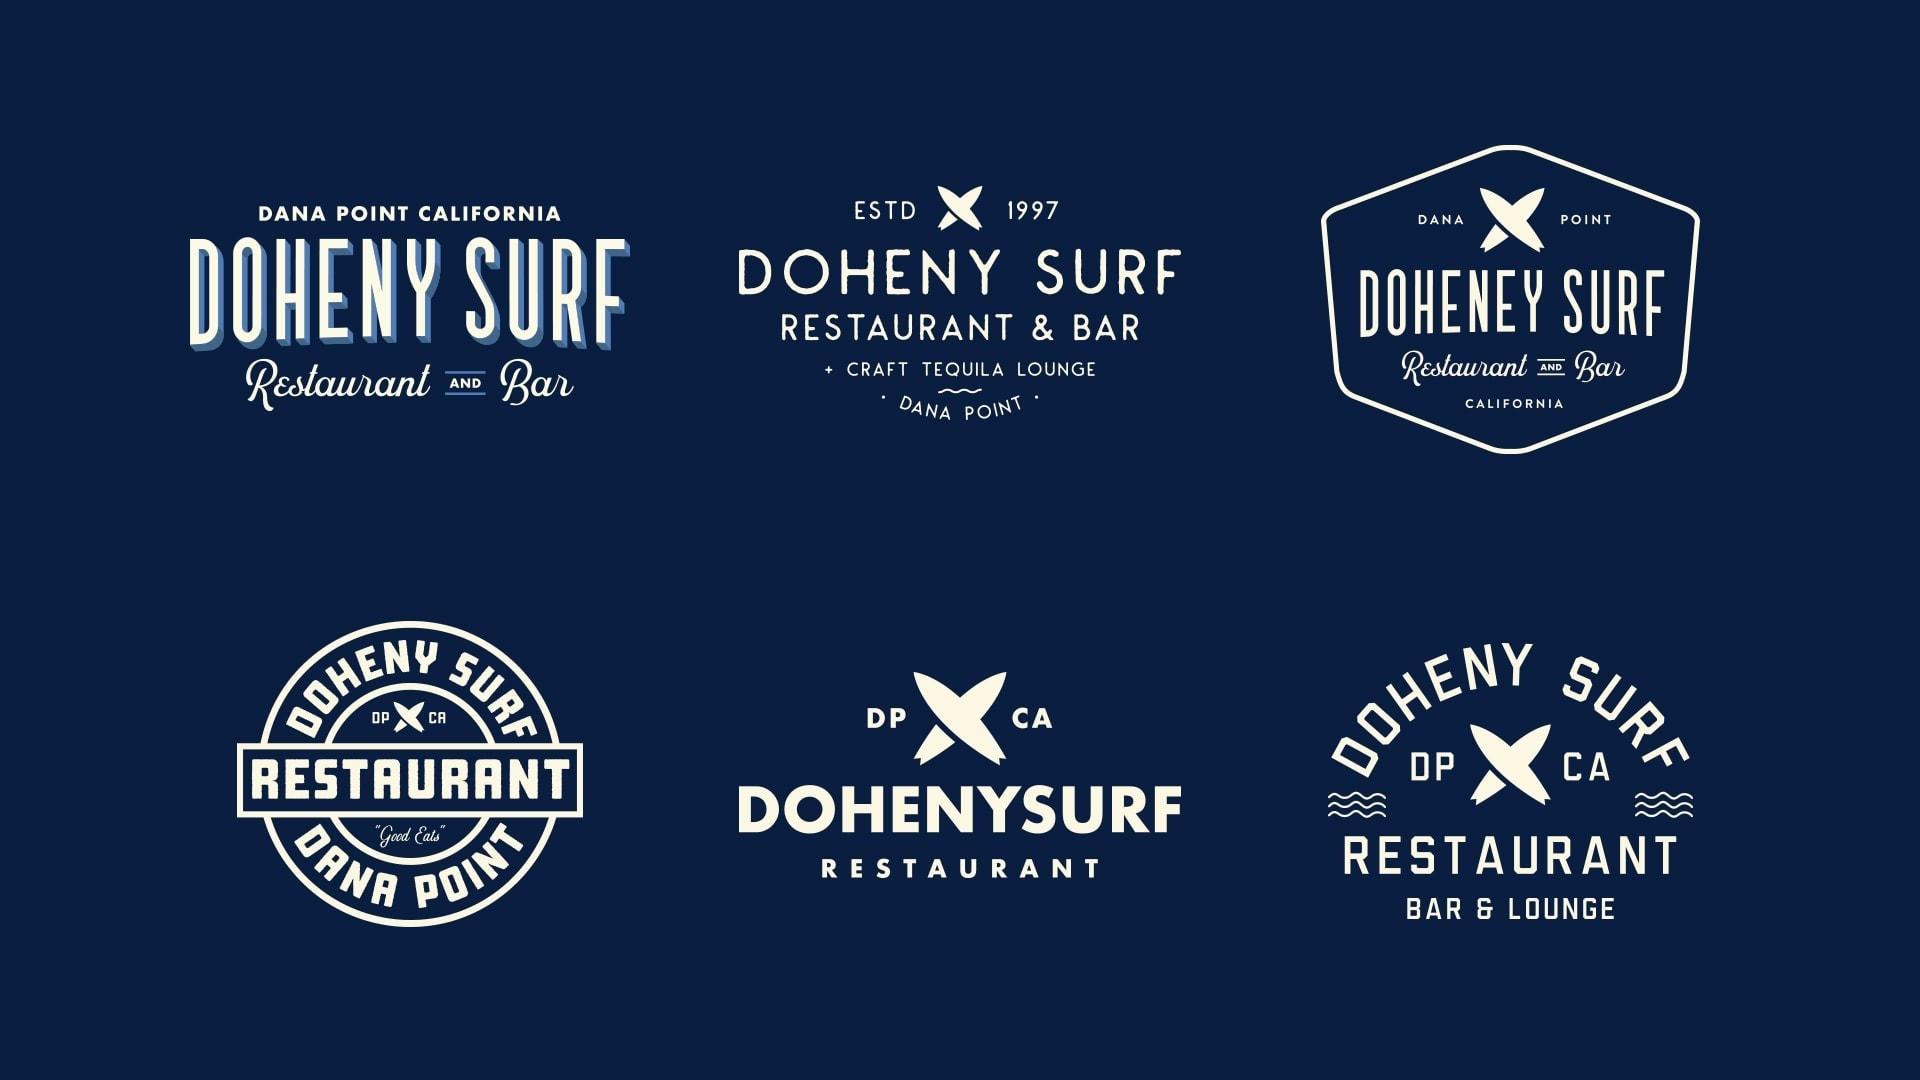 Doheny Surf Restaurant Doubletree Hotel Dana Point - Unsung Studio Branding